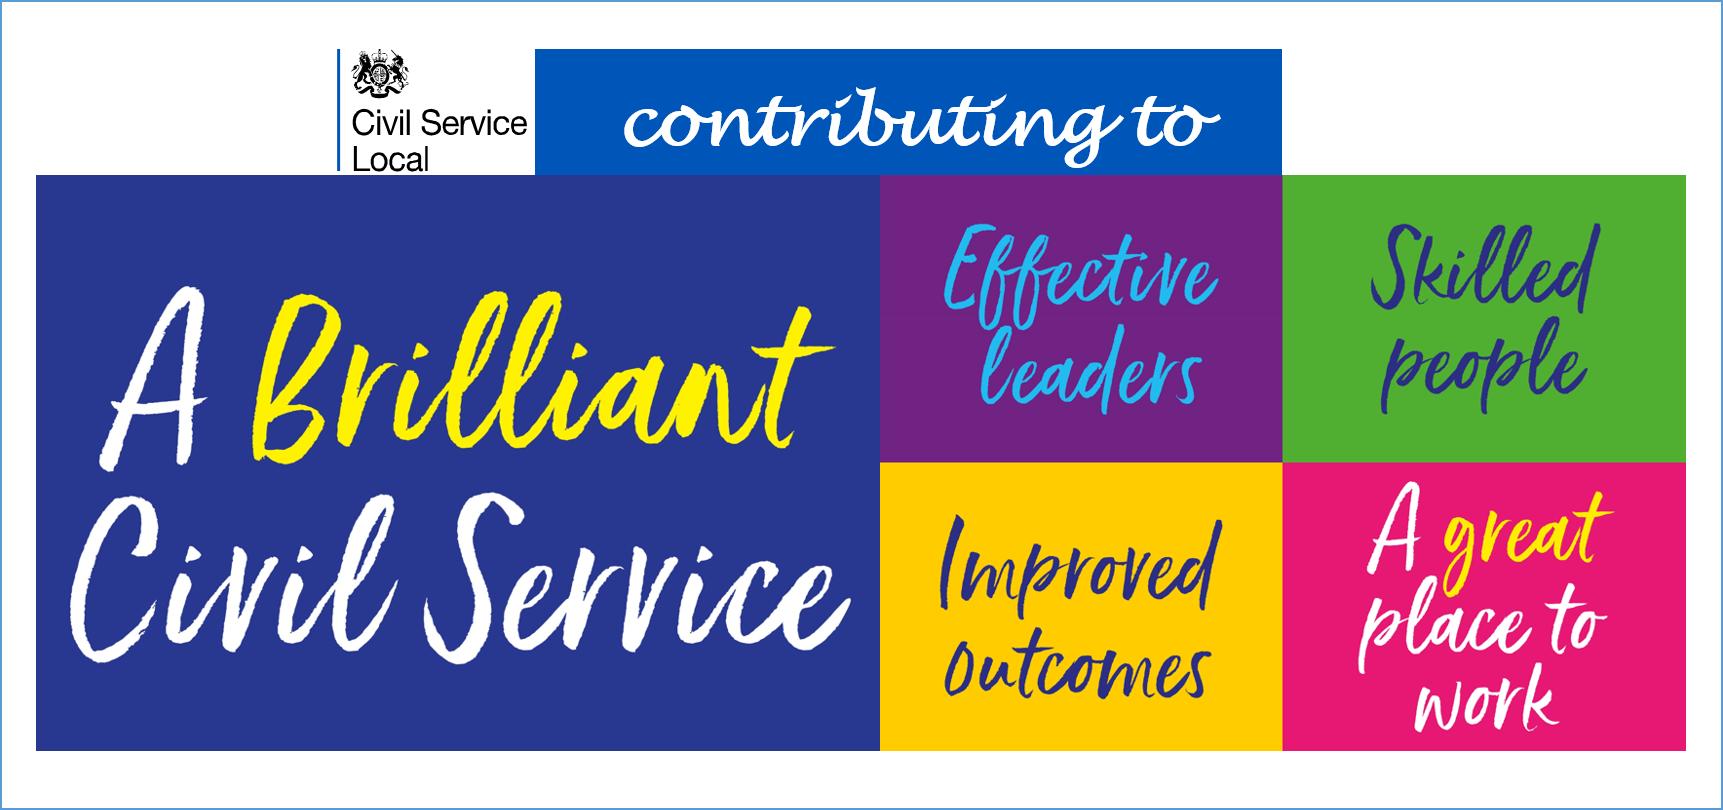 A text banner showing 'A Brilliant Civil Service...